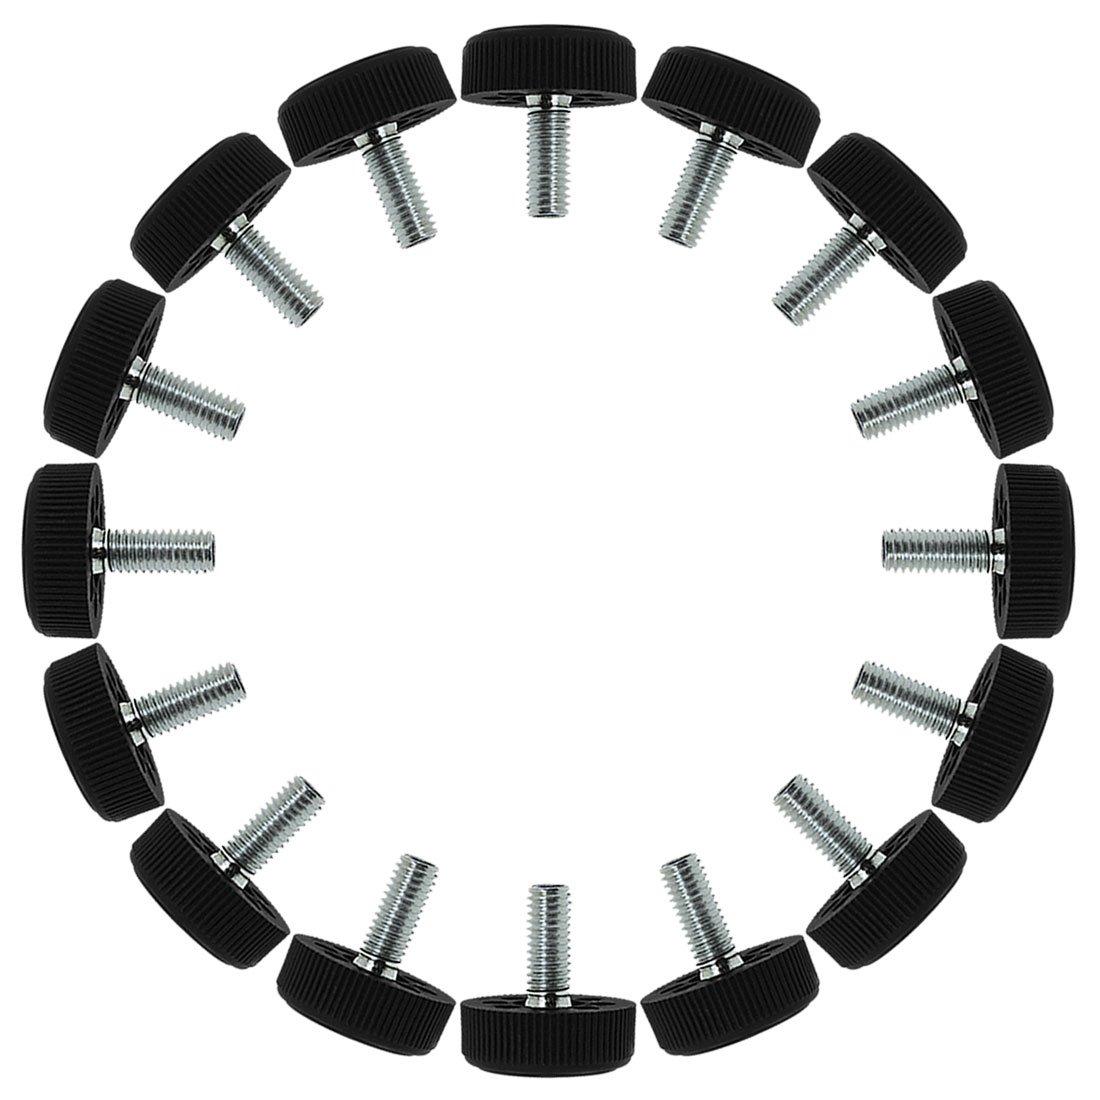 uxcell M8 x 20 x 30mm Screw on Furniture Glide Leveling Feet Floor Protector Adjustable Leveler for Table Desk Leg 16 Pack